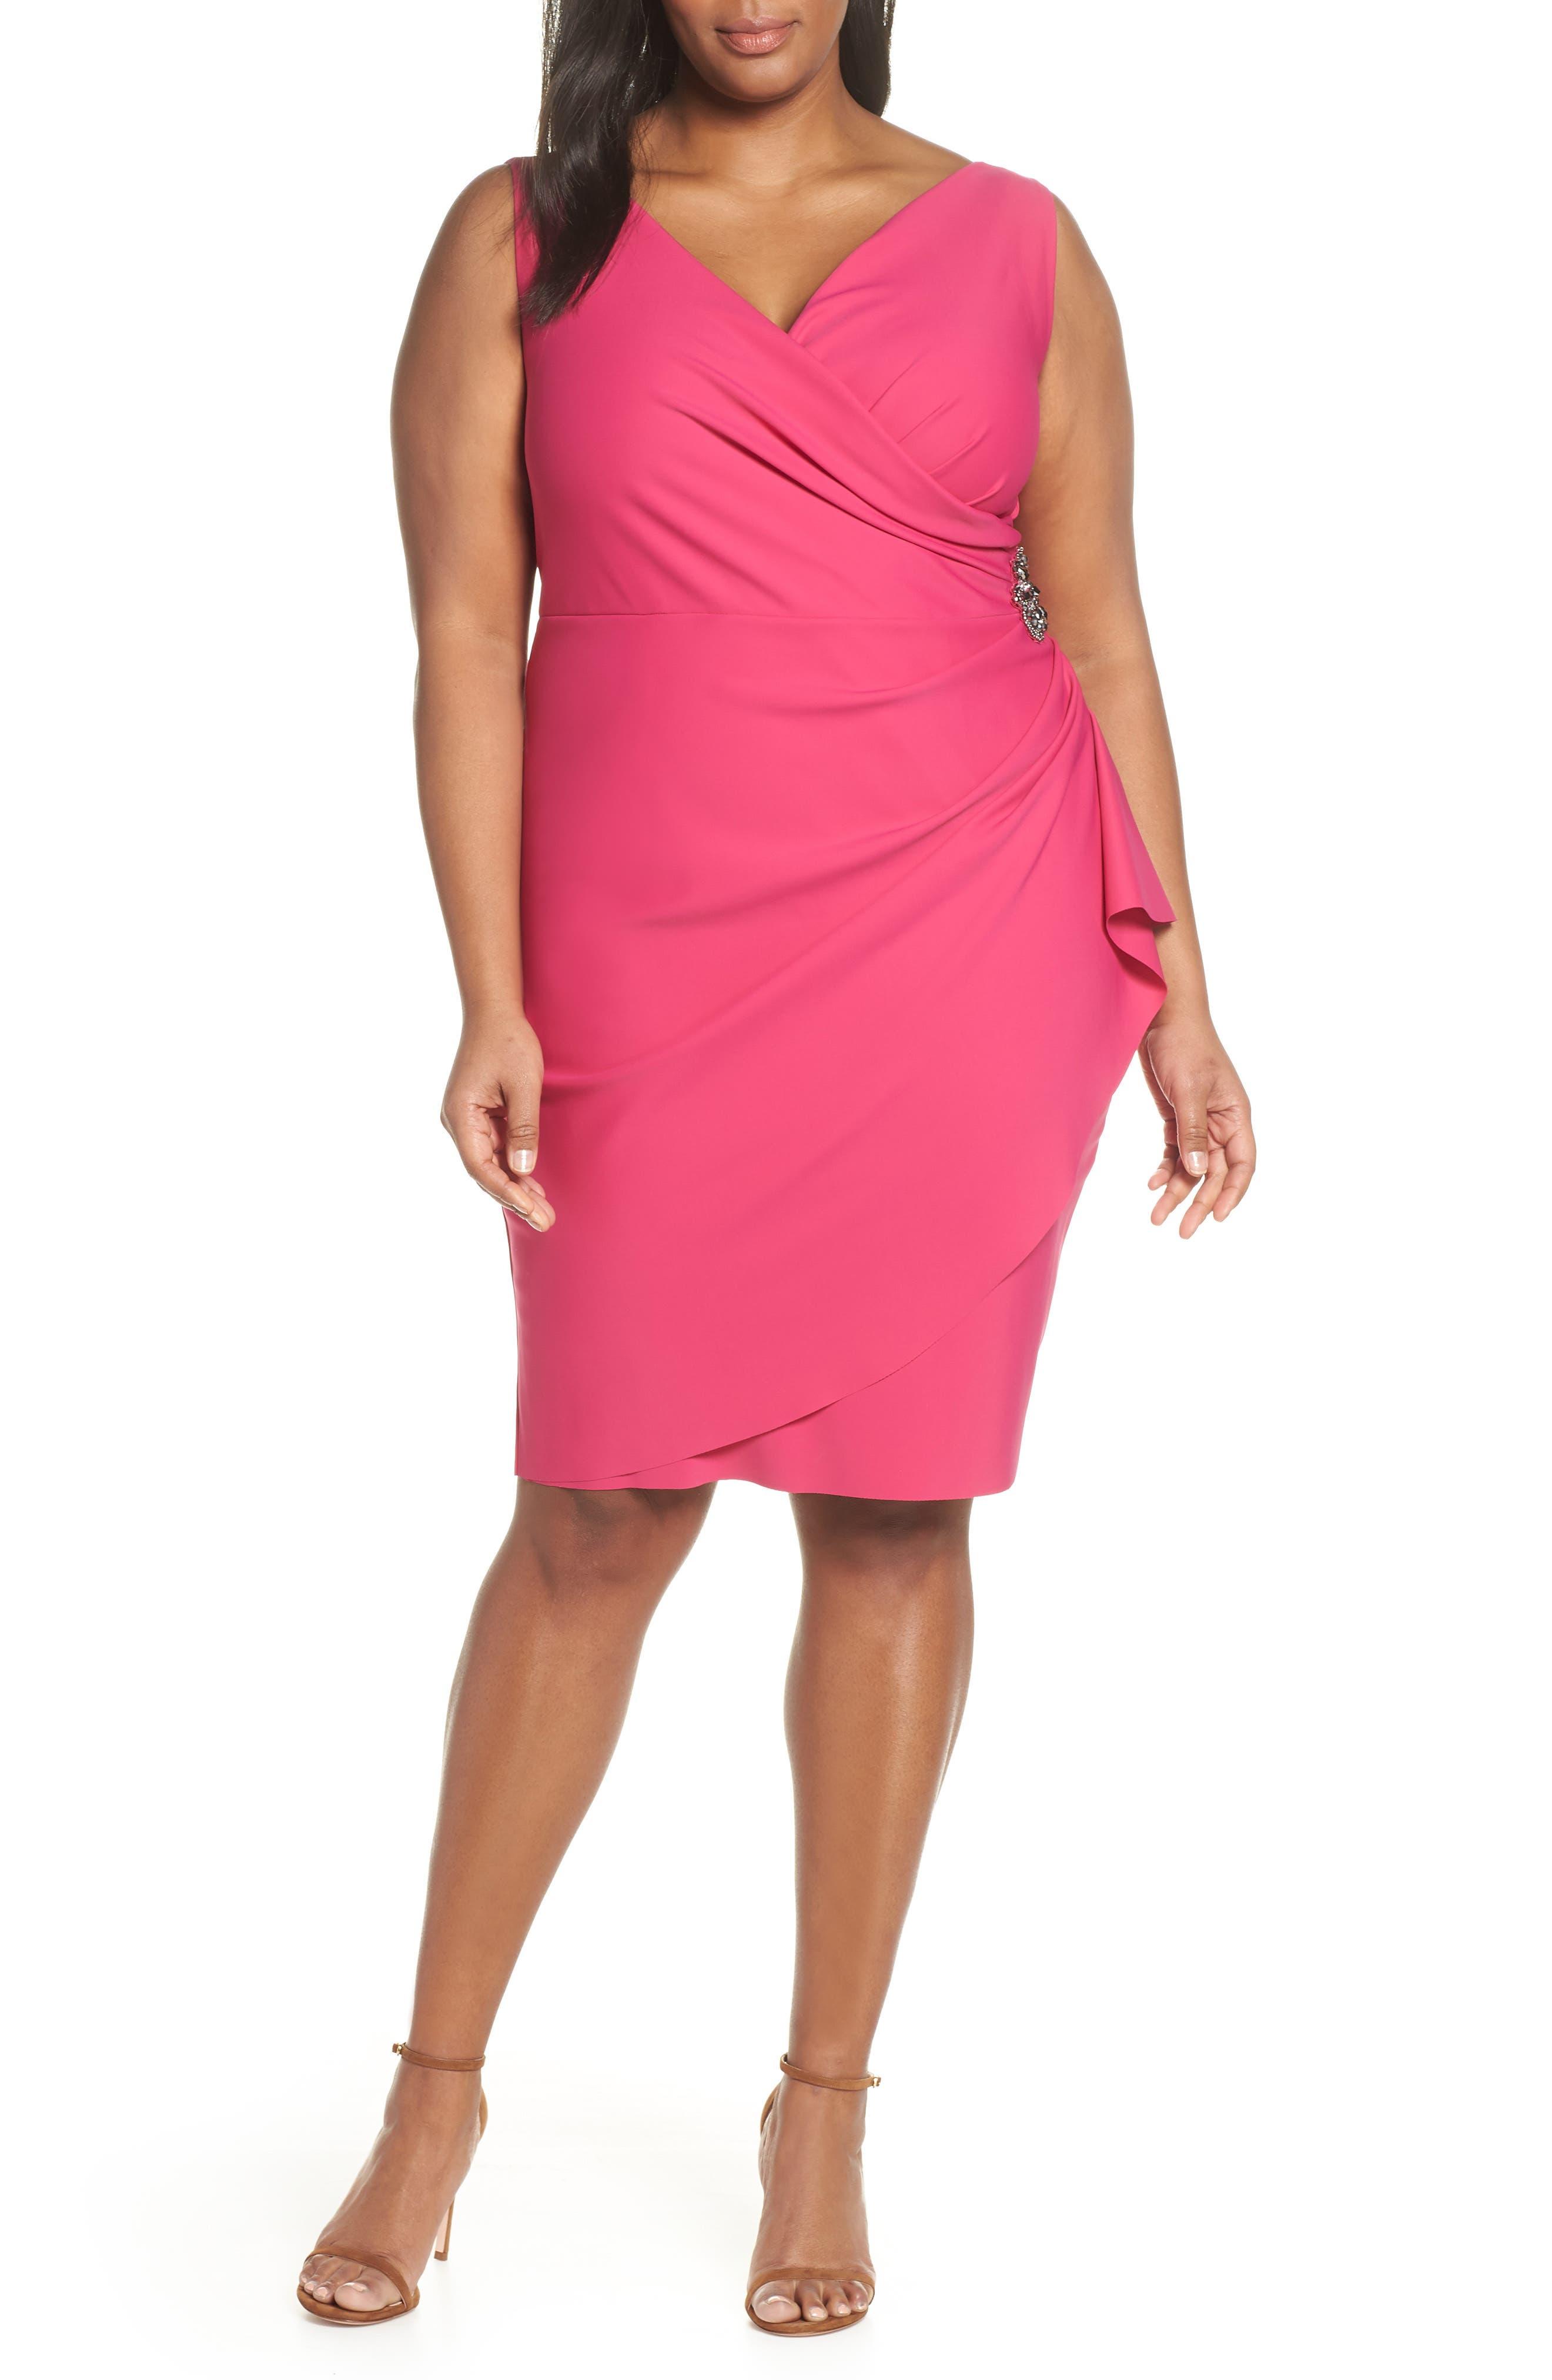 Plus Size Alex Evenings Embellished Surplice Sheath Dress, Pink